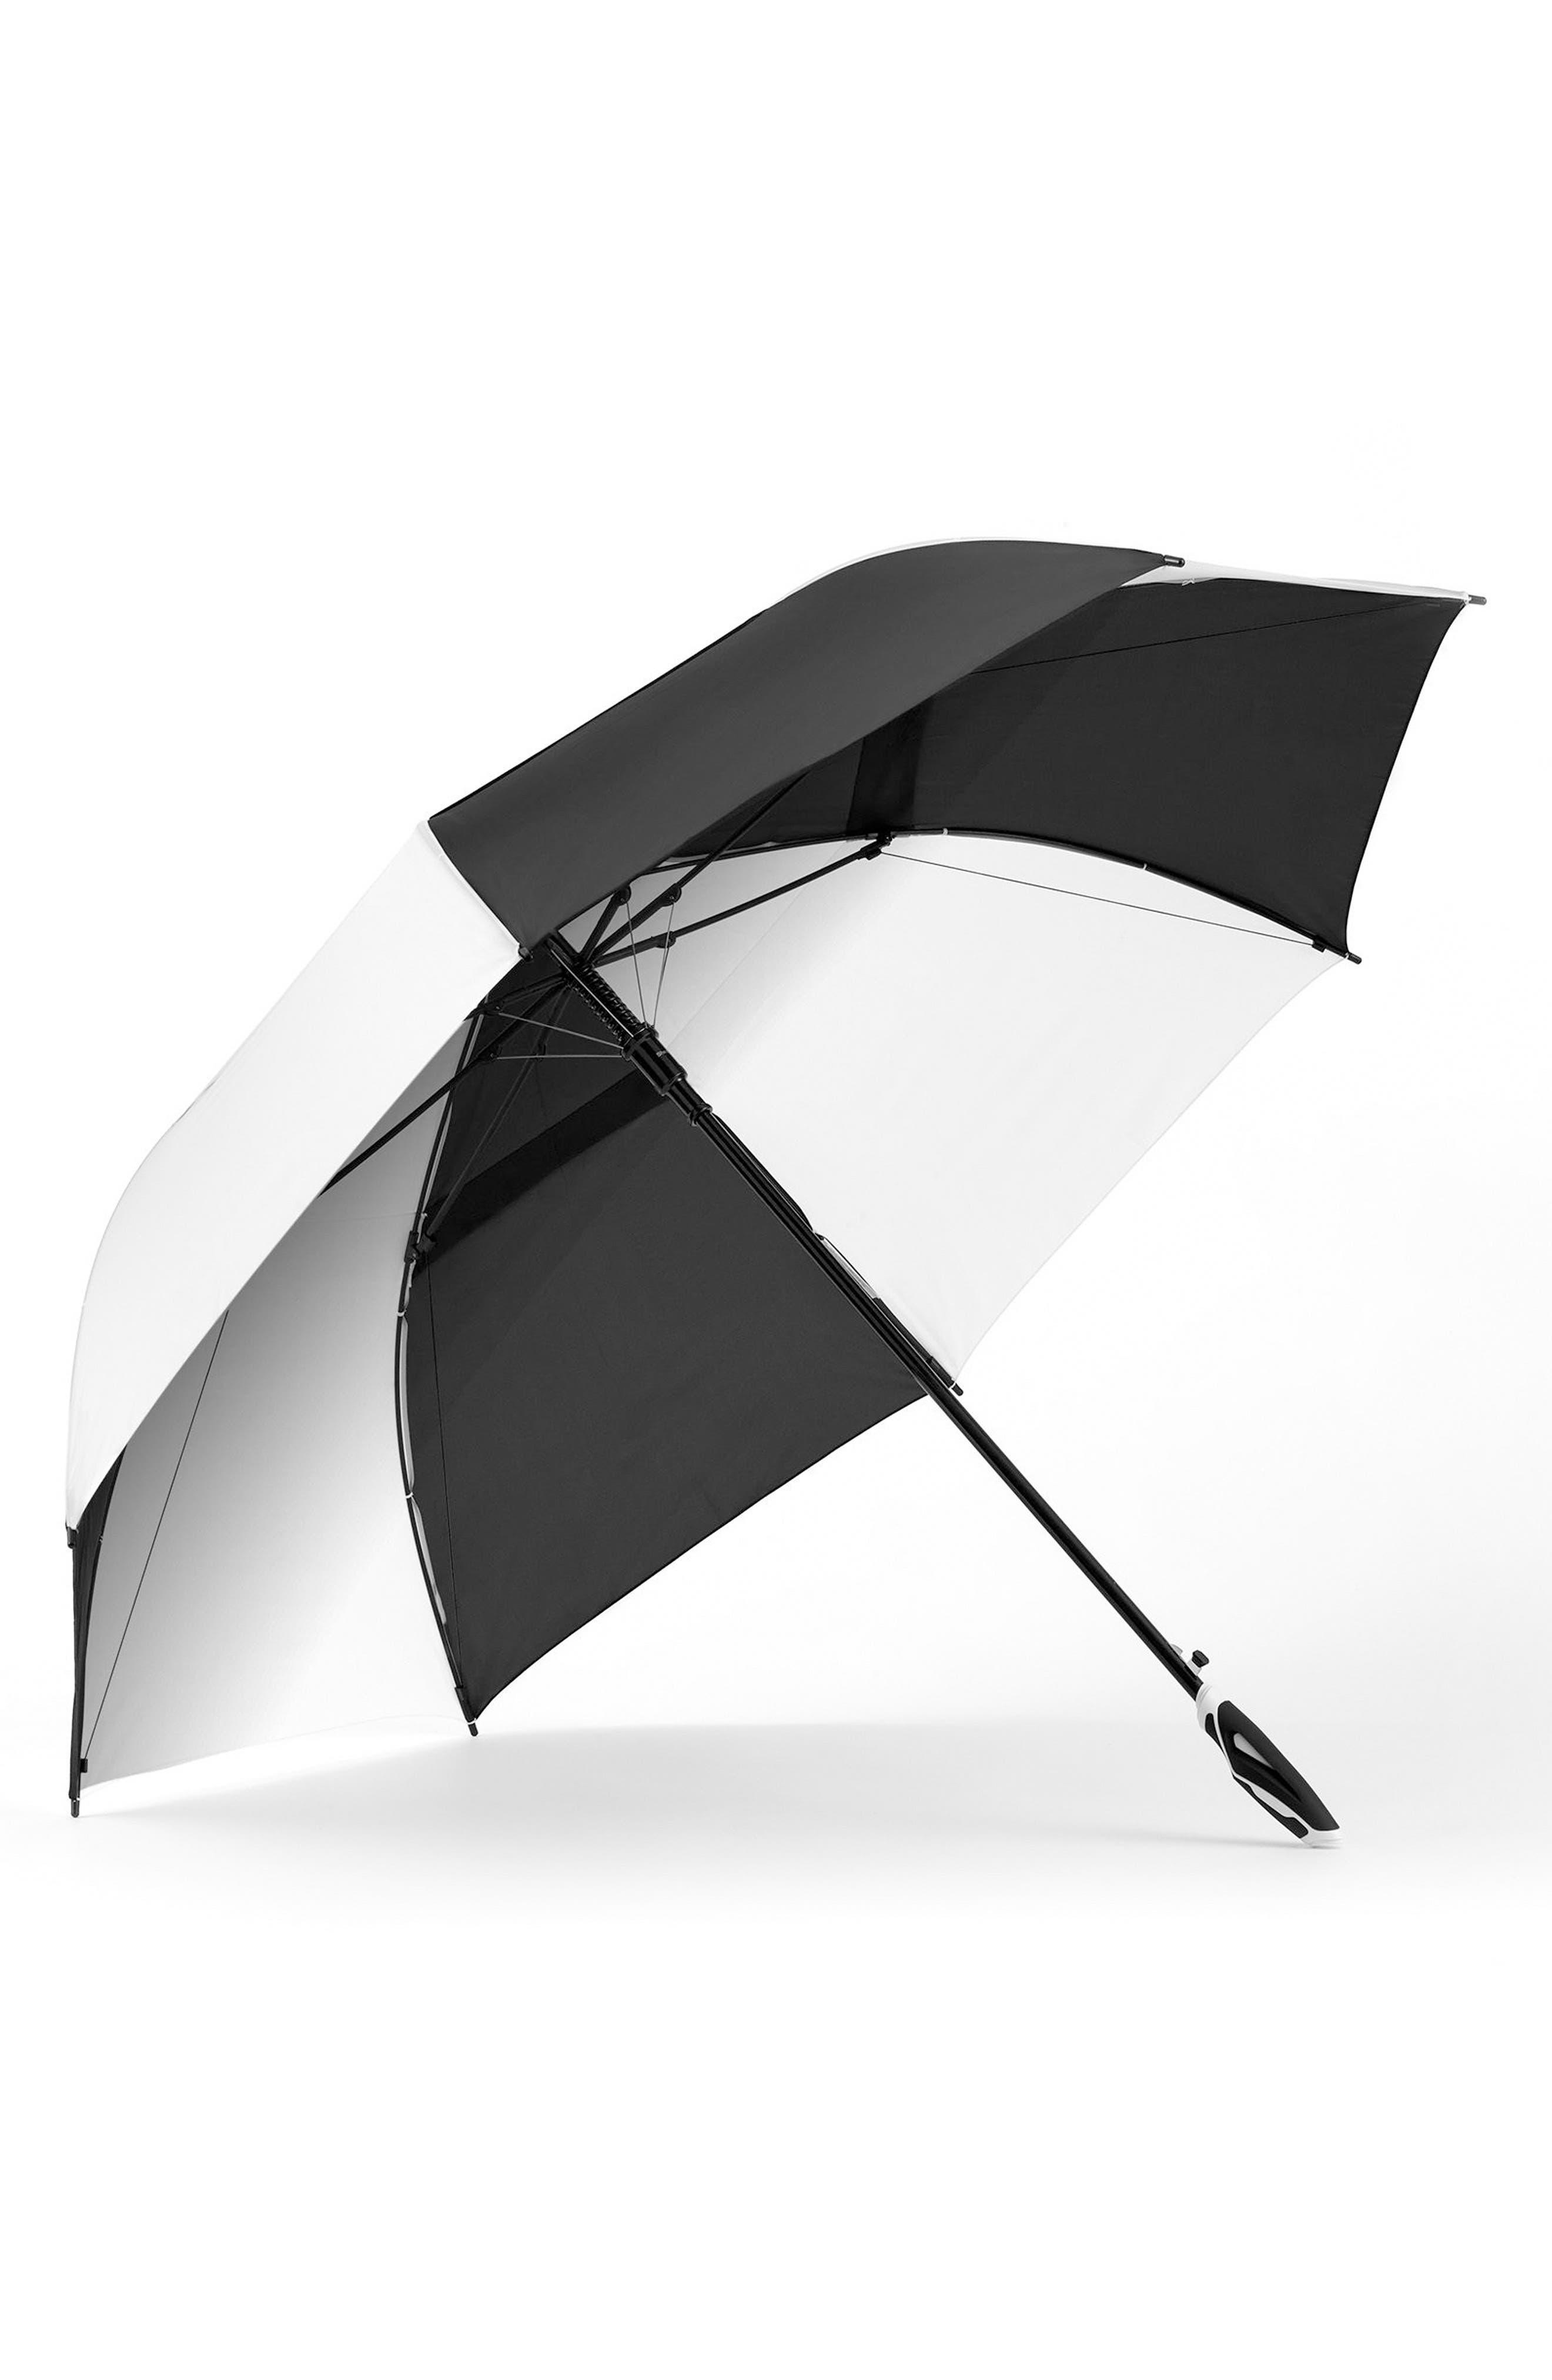 Main Image - ShedRain 'WindJammer®' Auto Open Golf Umbrella